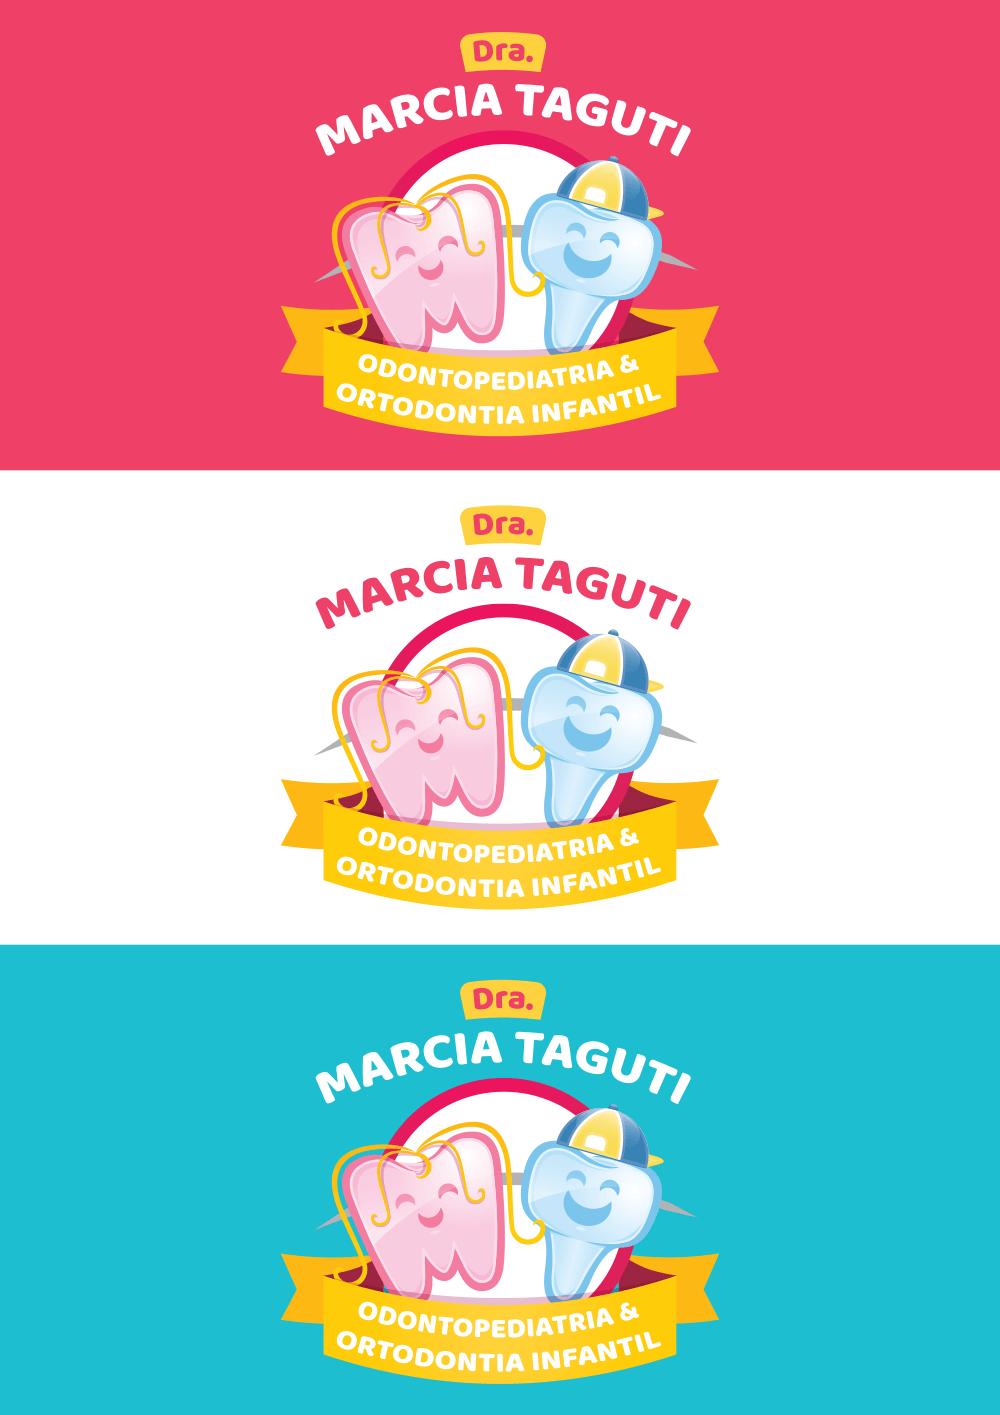 apresentacao-id-visual-dra-marcia-taguti-04-1